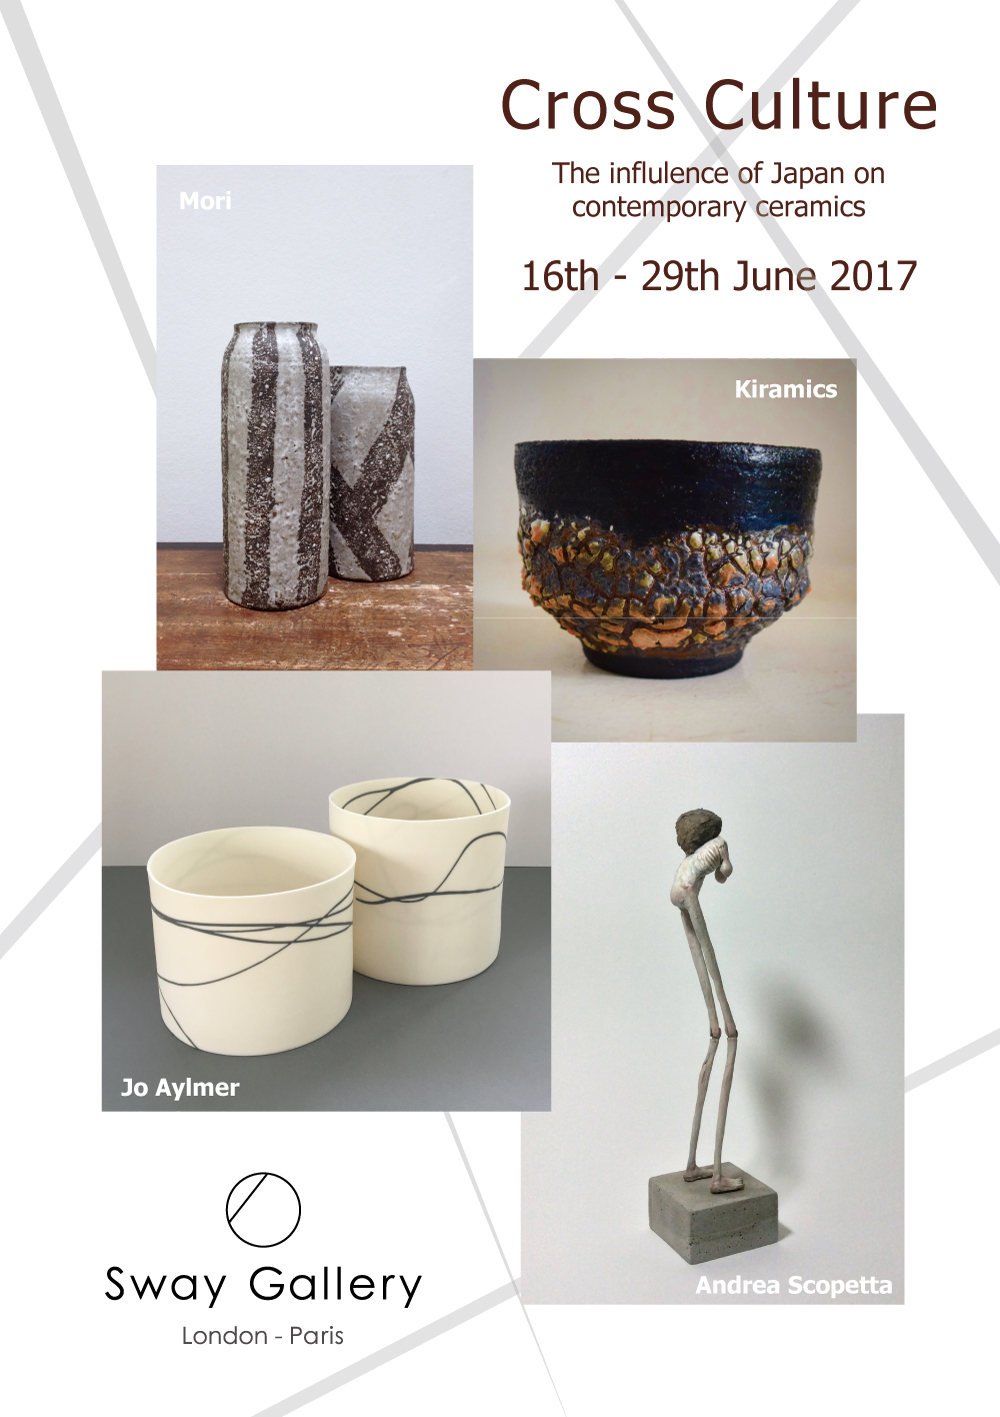 Cross Culture, a ceramics selling exhibition